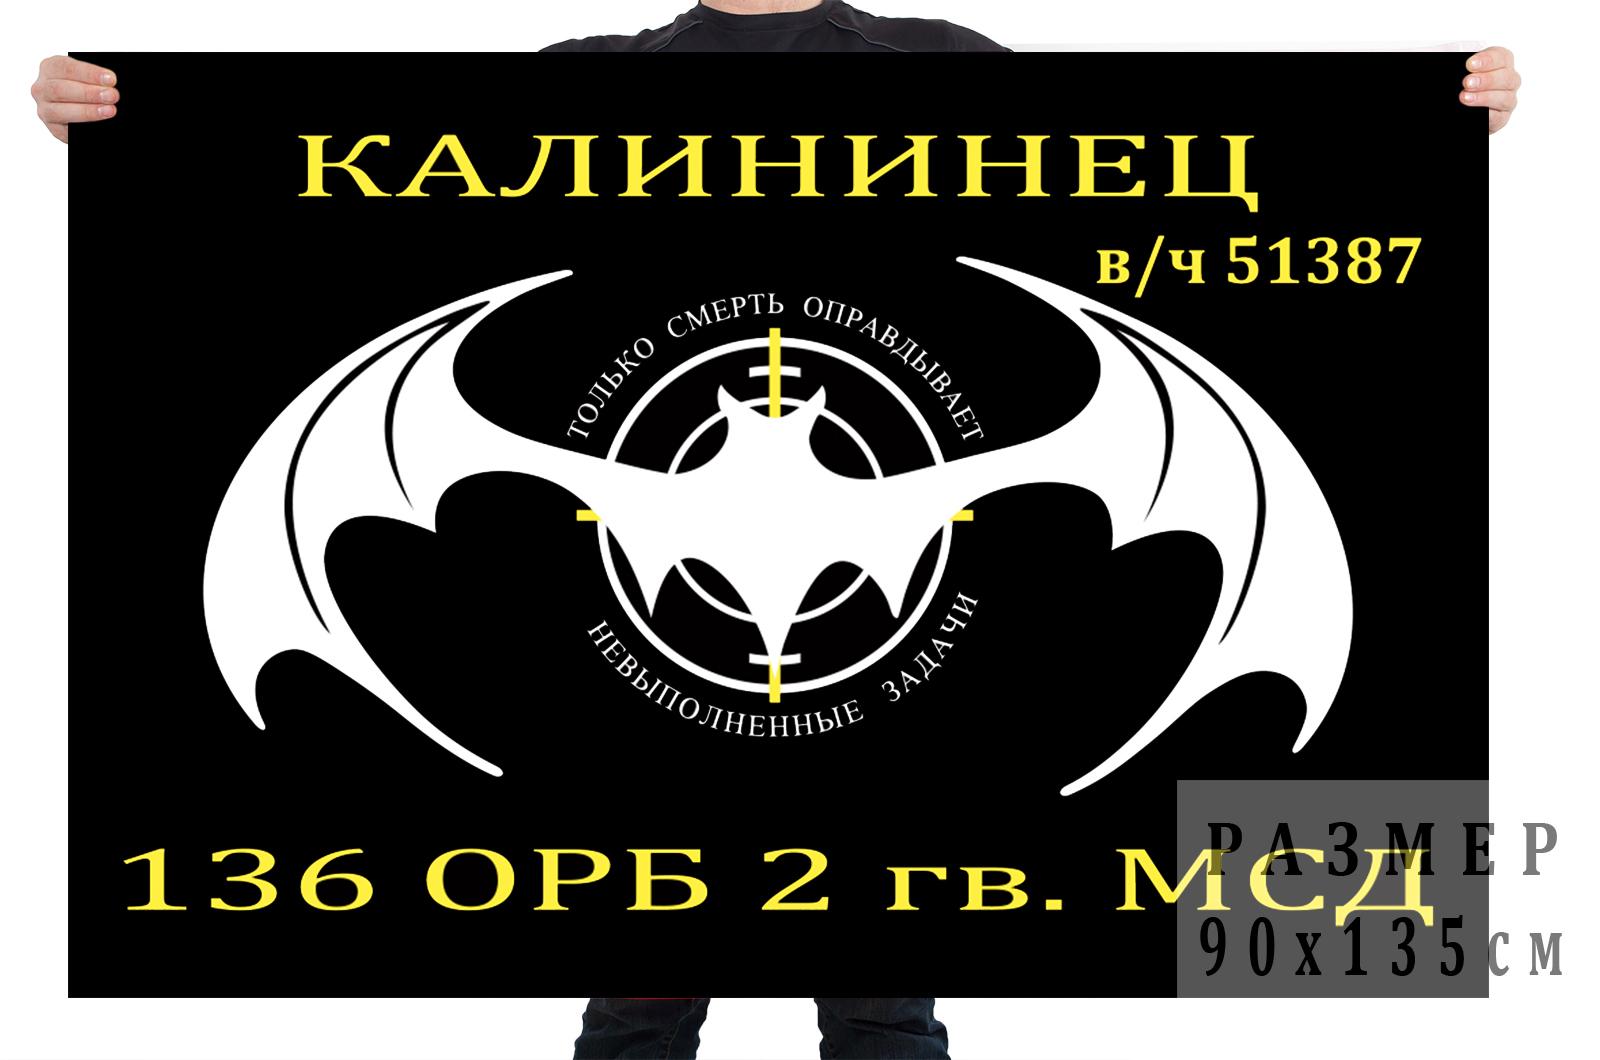 Флаг 136 ОРБ 2 гв. МСД спецназа ГРУ